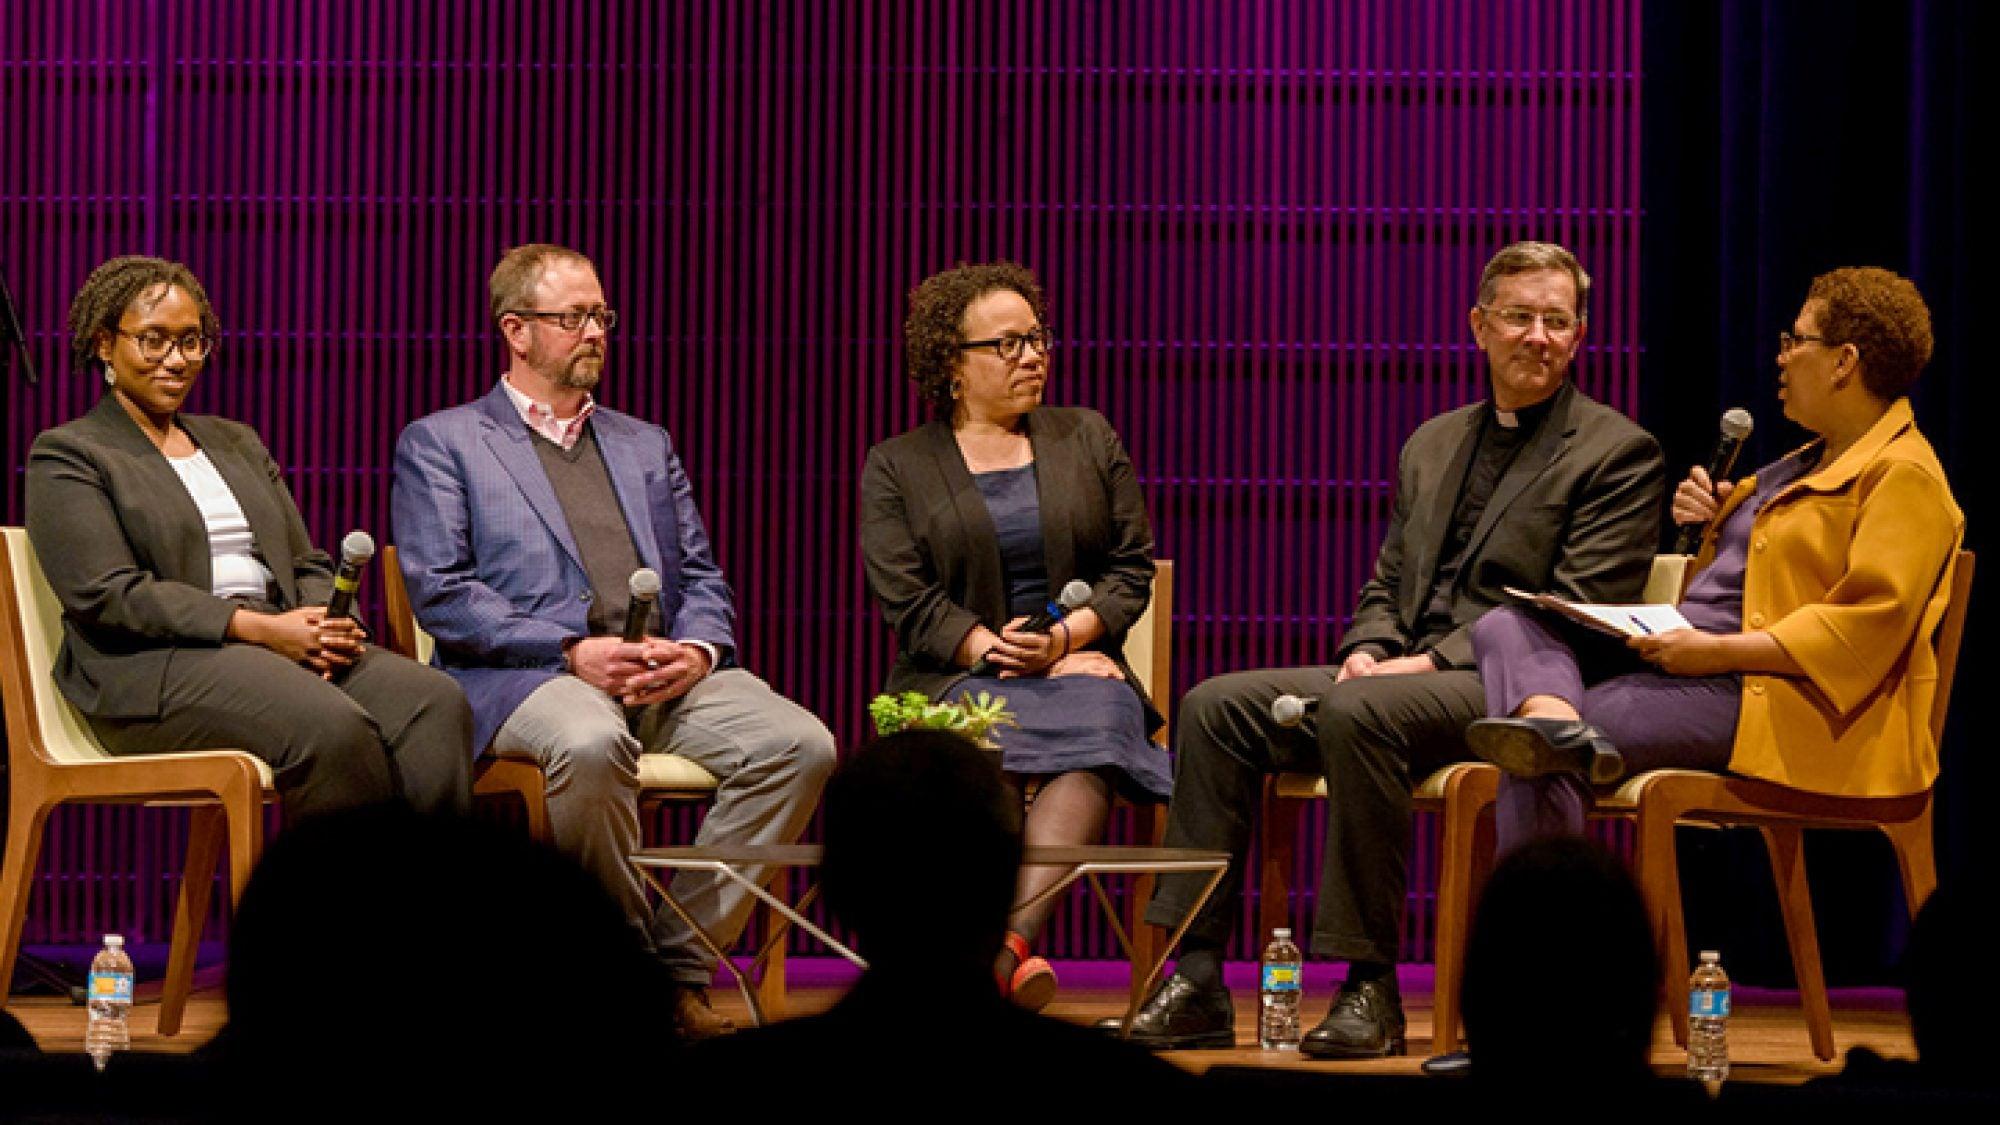 Panelists sit on a stage